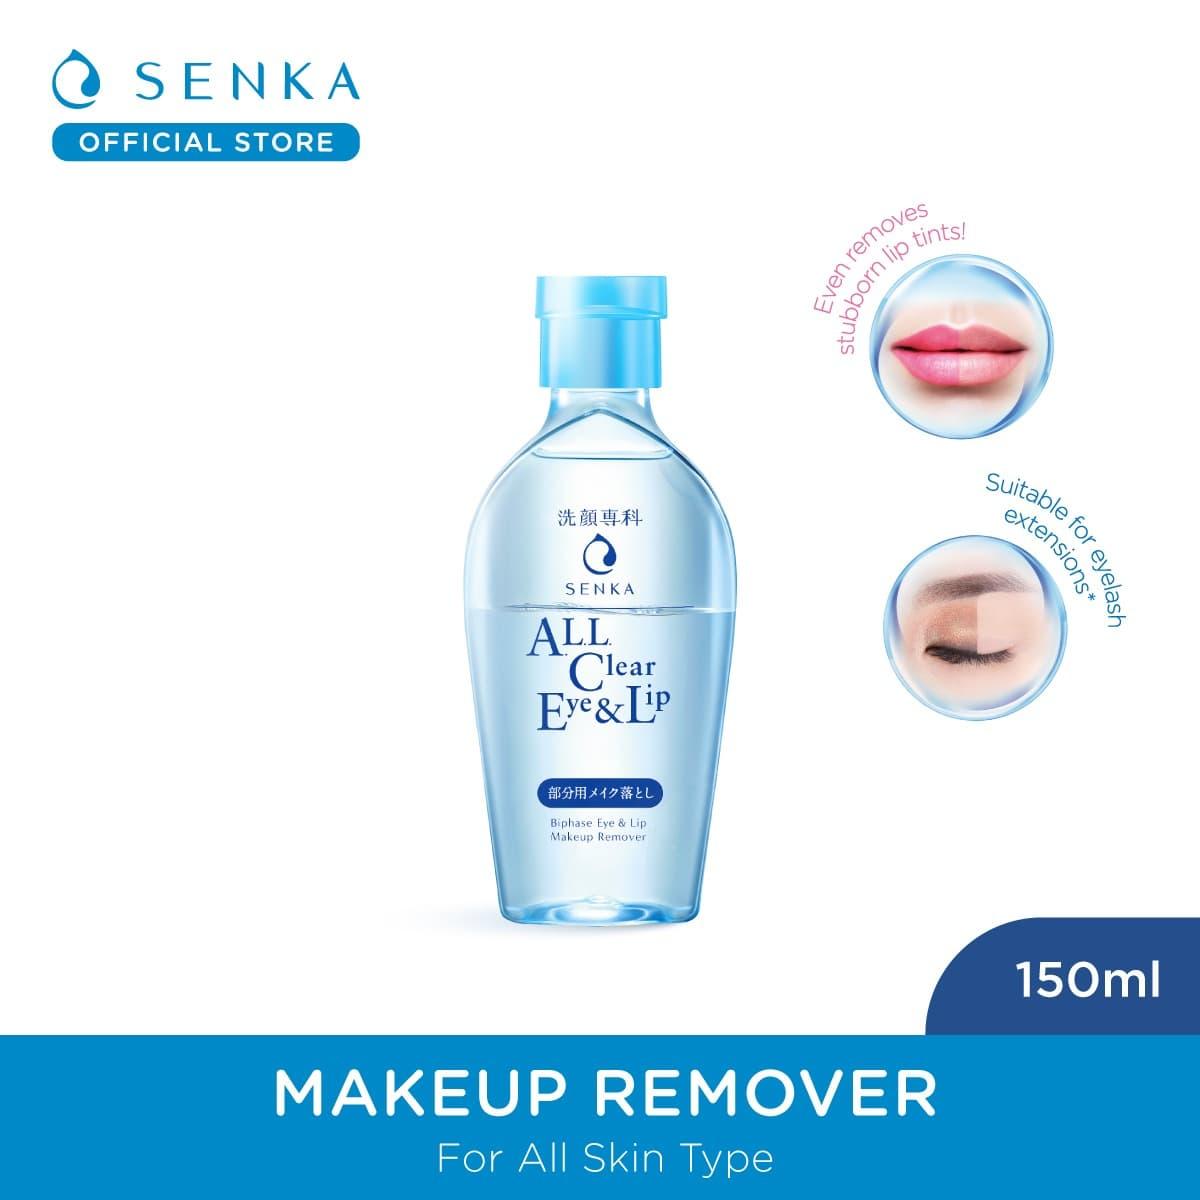 SENKA All Clear Eye & Lip (150mL) thumbnail